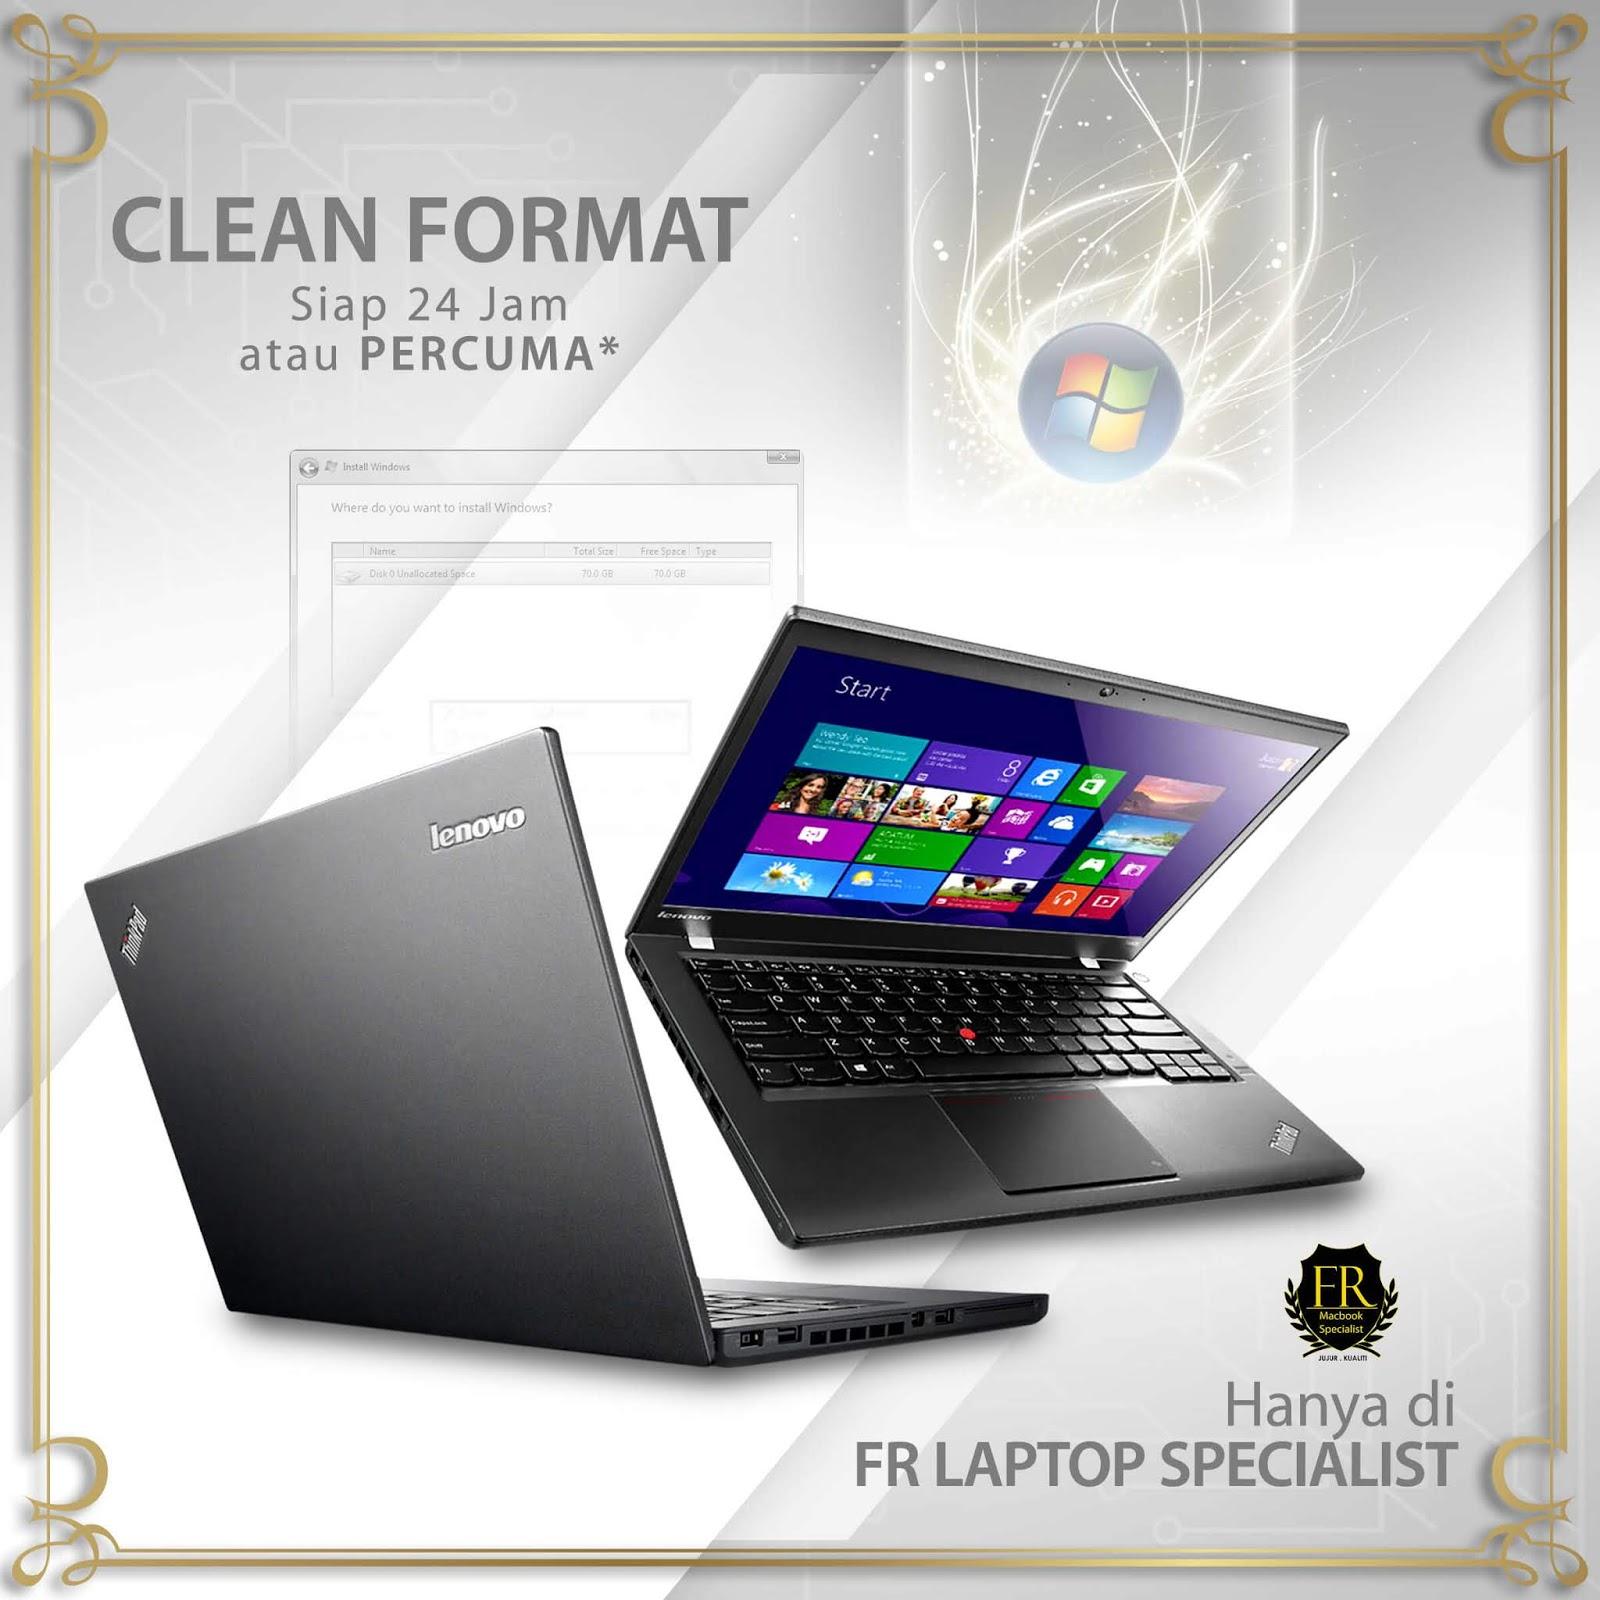 FR Laptop Kedai Format Laptop Murah Di KL